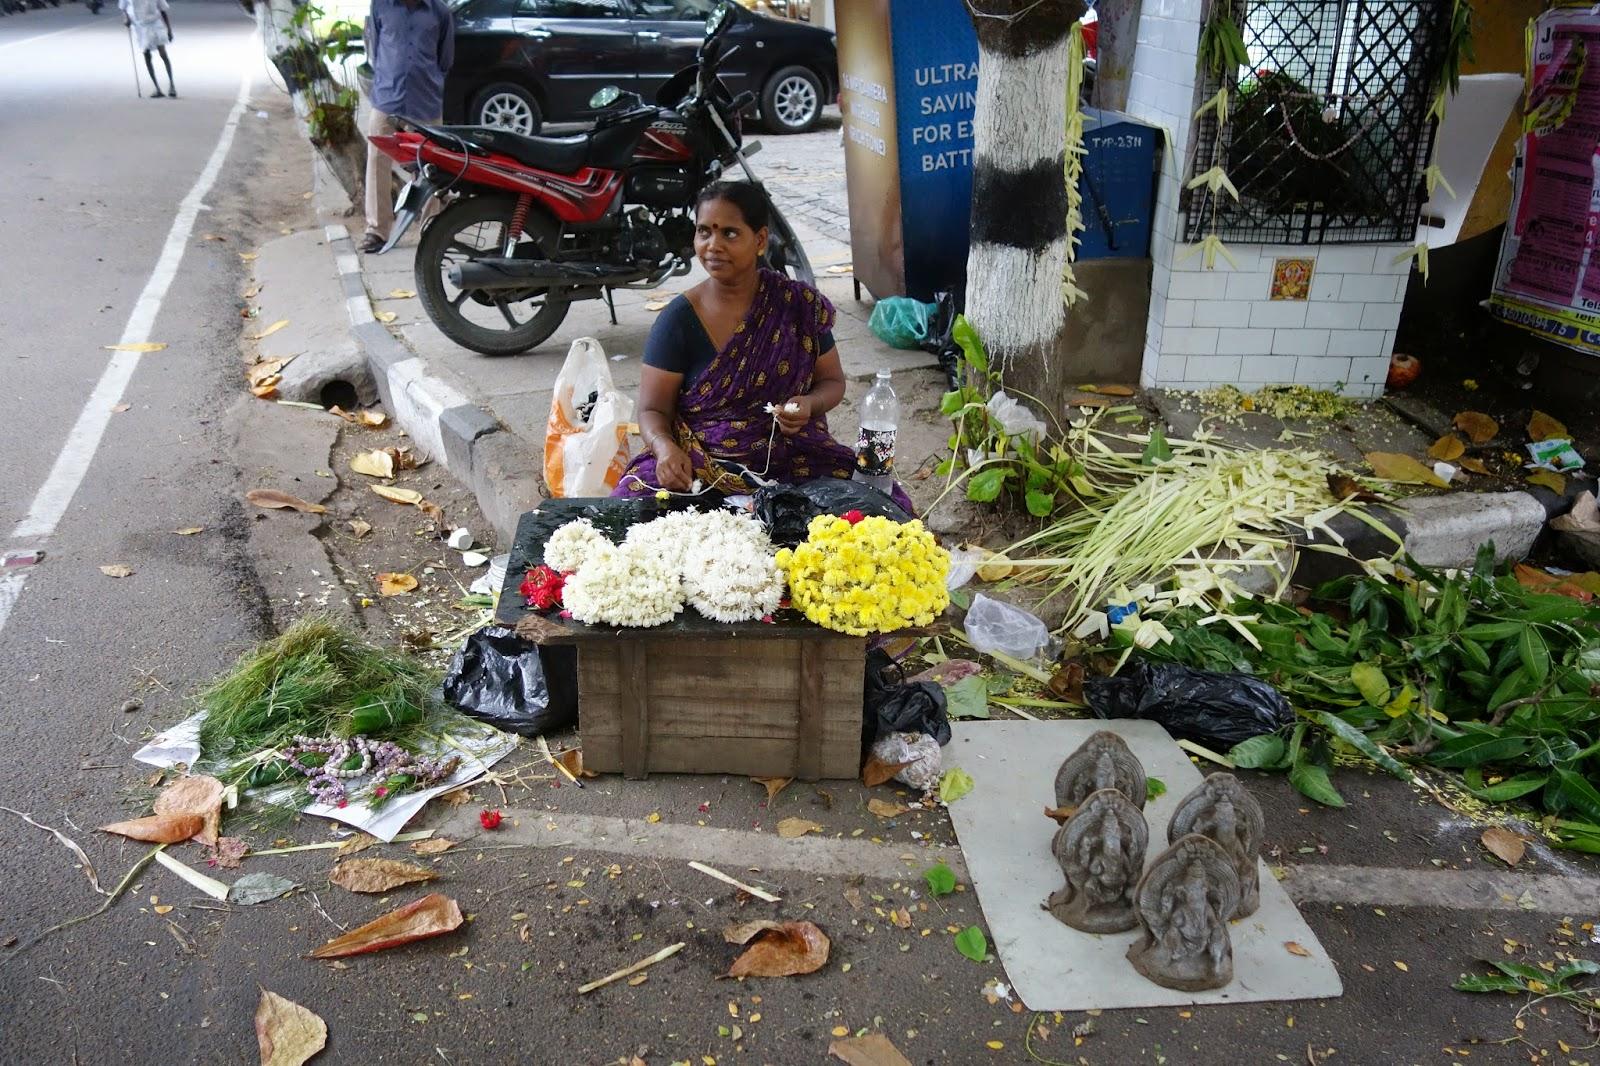 Ganesh chaturthi flowers may flower blog - Chennai Holidays Ganesh Chaturthi